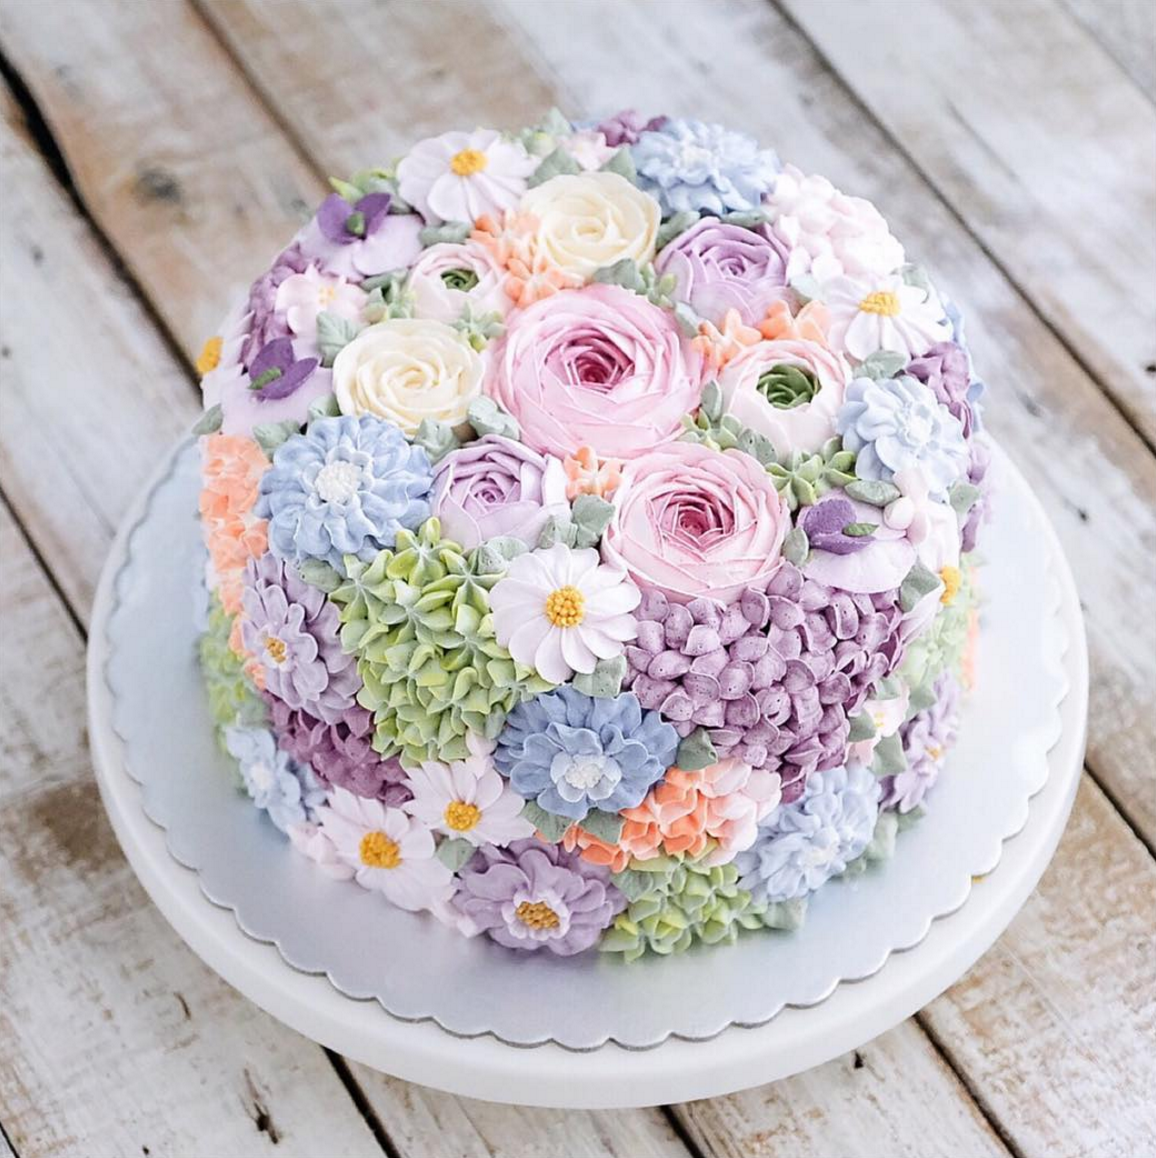 Buttercream Wedding Cake Covered In Flowers Indonesian